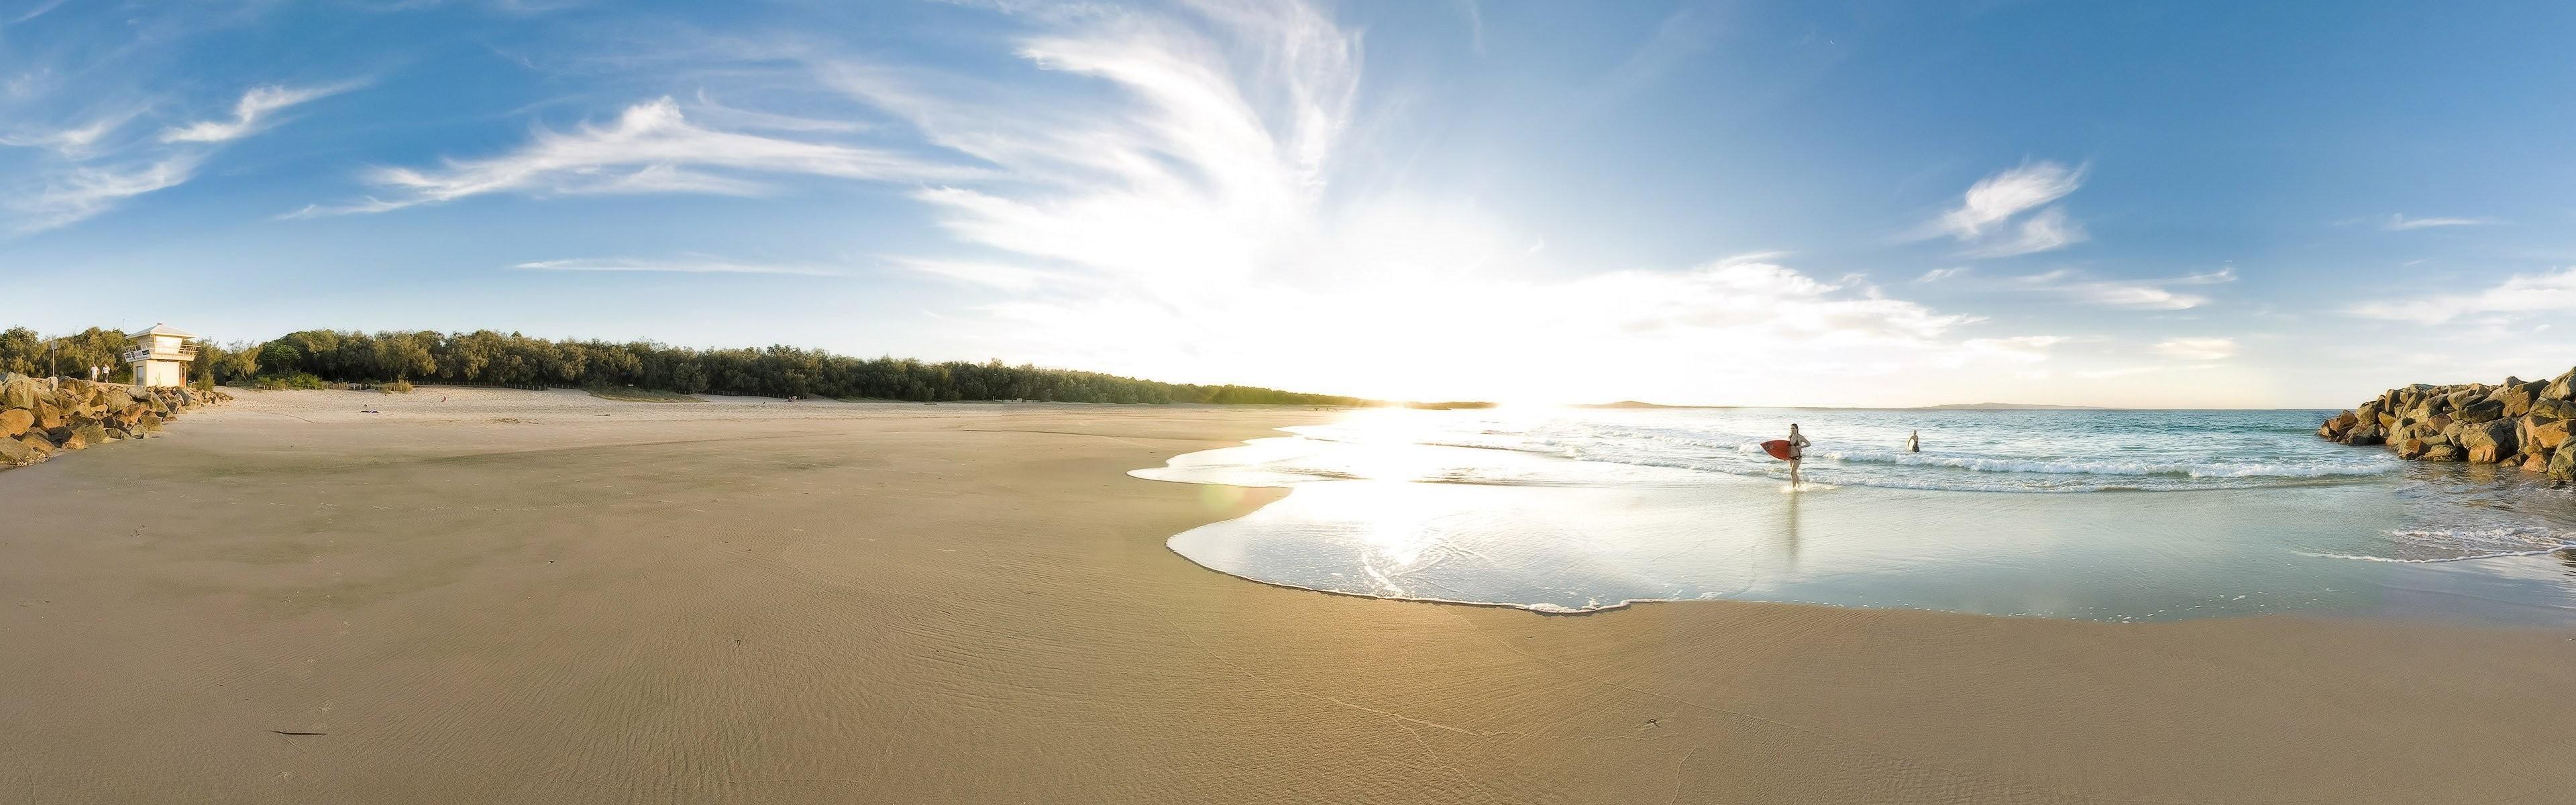 beach sand sea girls surfing stones dual screen